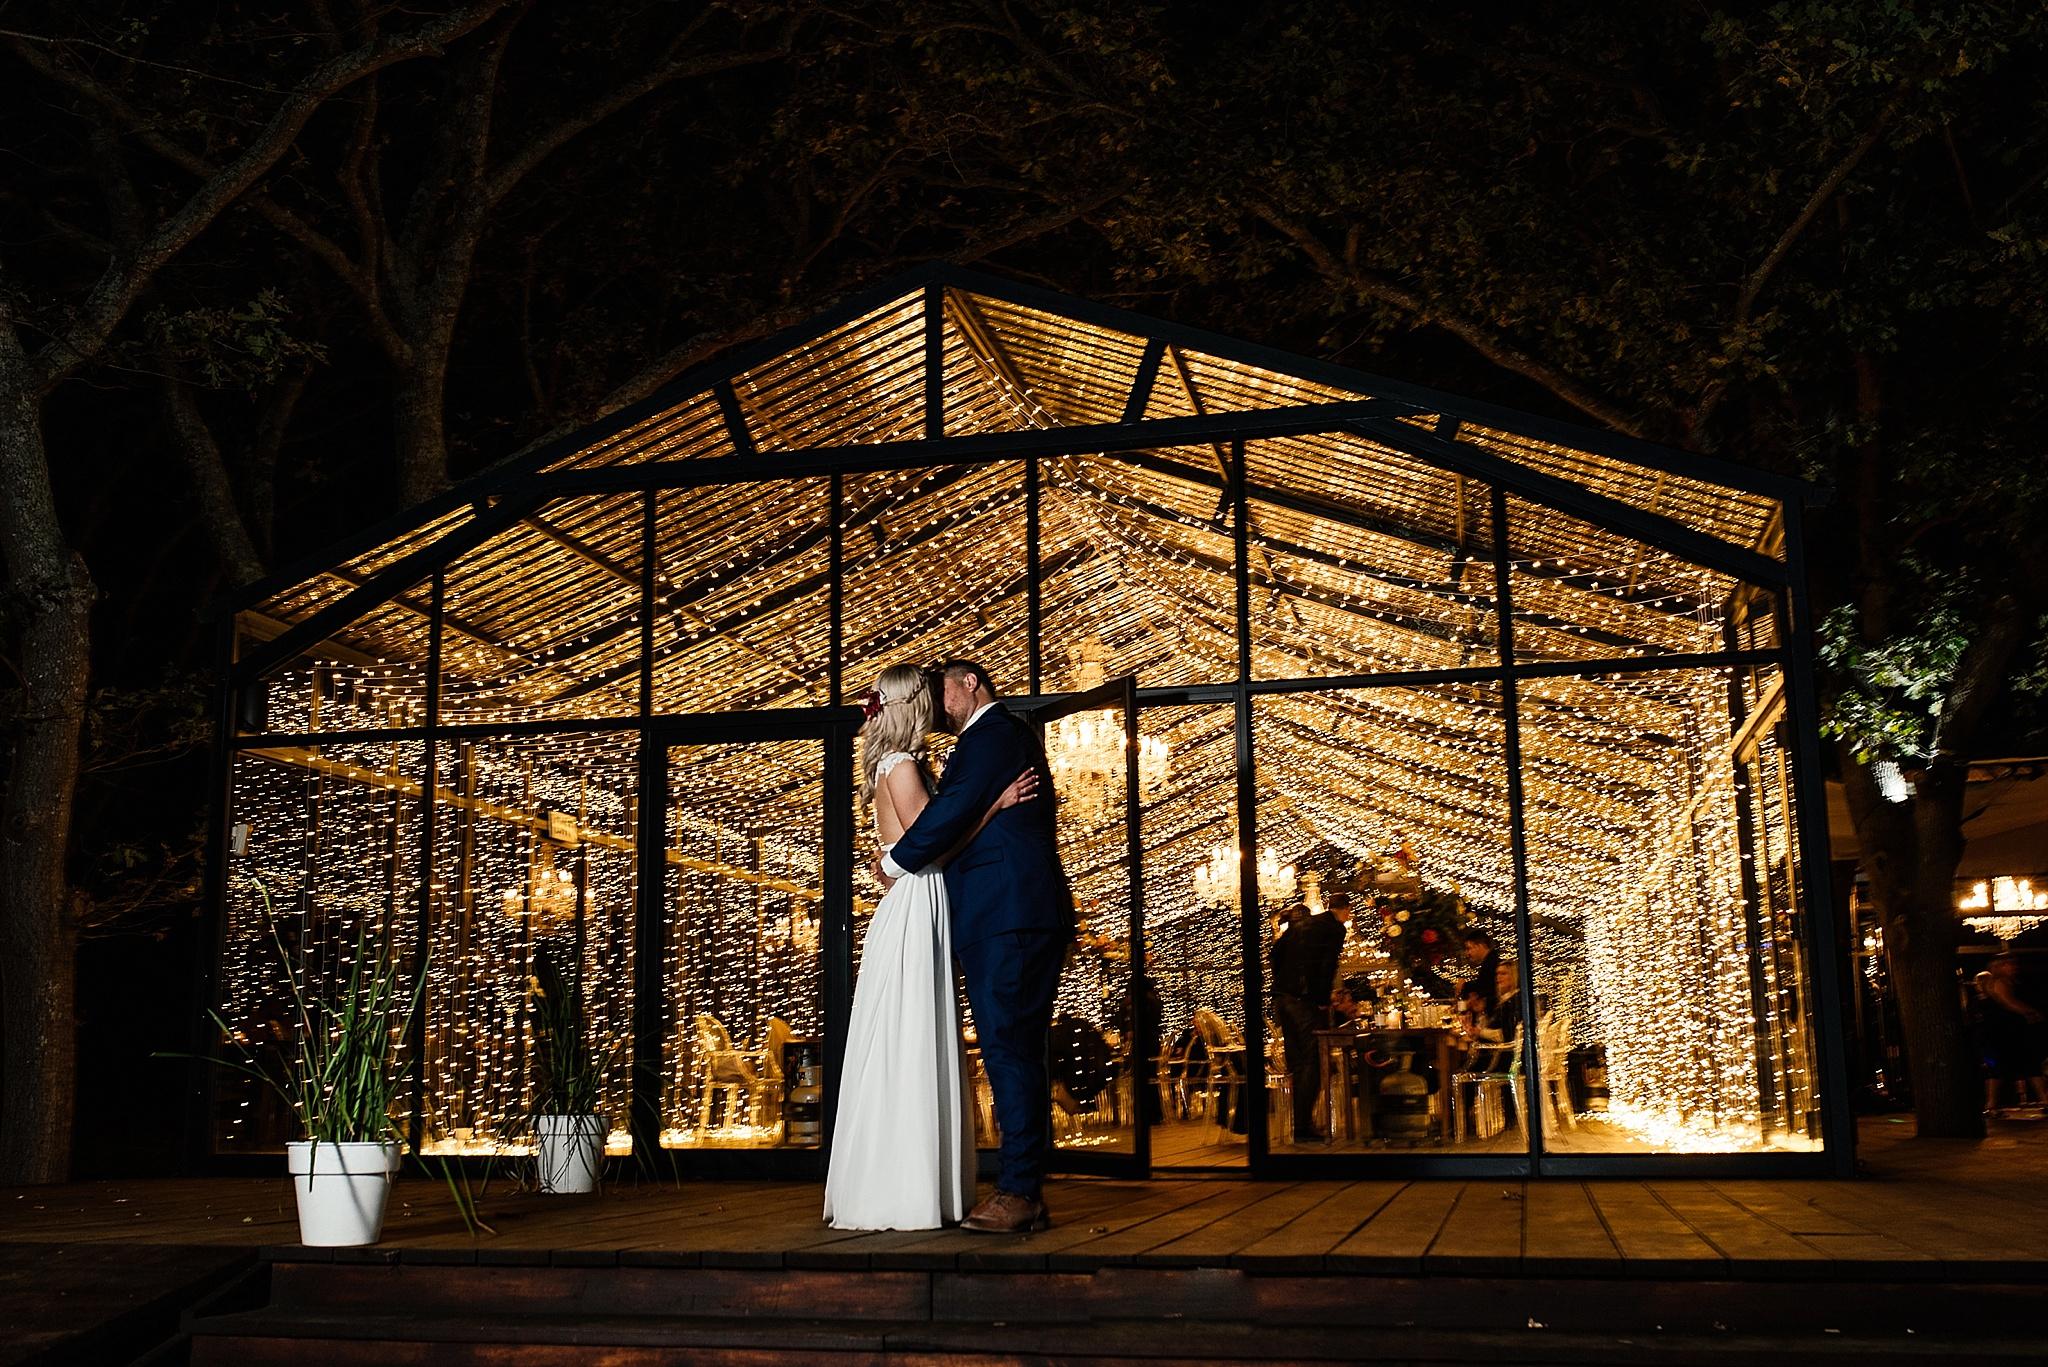 Cape Town Photographer Darren Bester - Die Woud Wedding - Gareth & Roxanne_0066.jpg